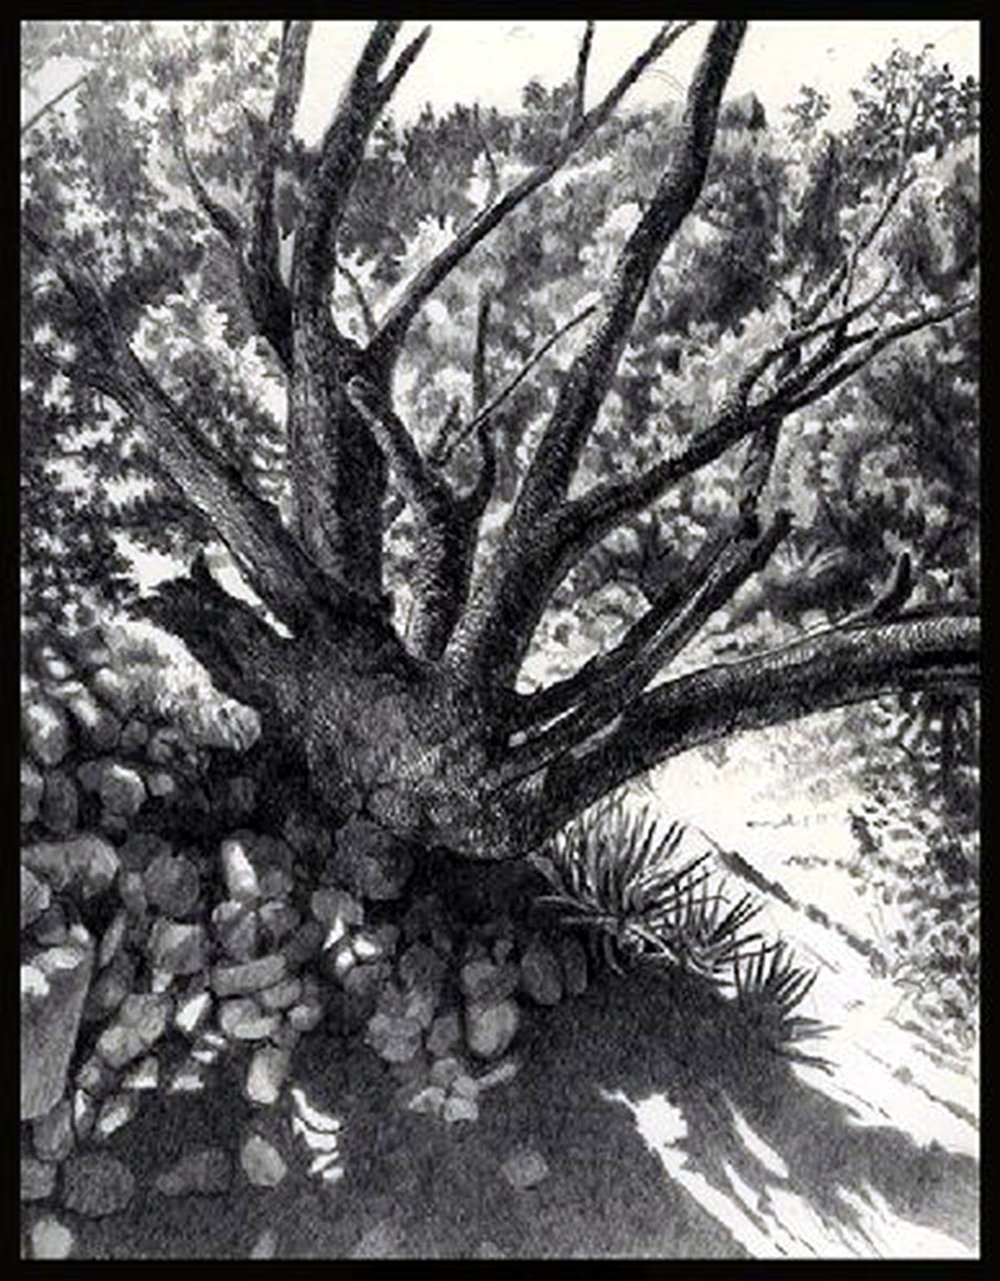 387_Sedona_Tree_HR.jpg